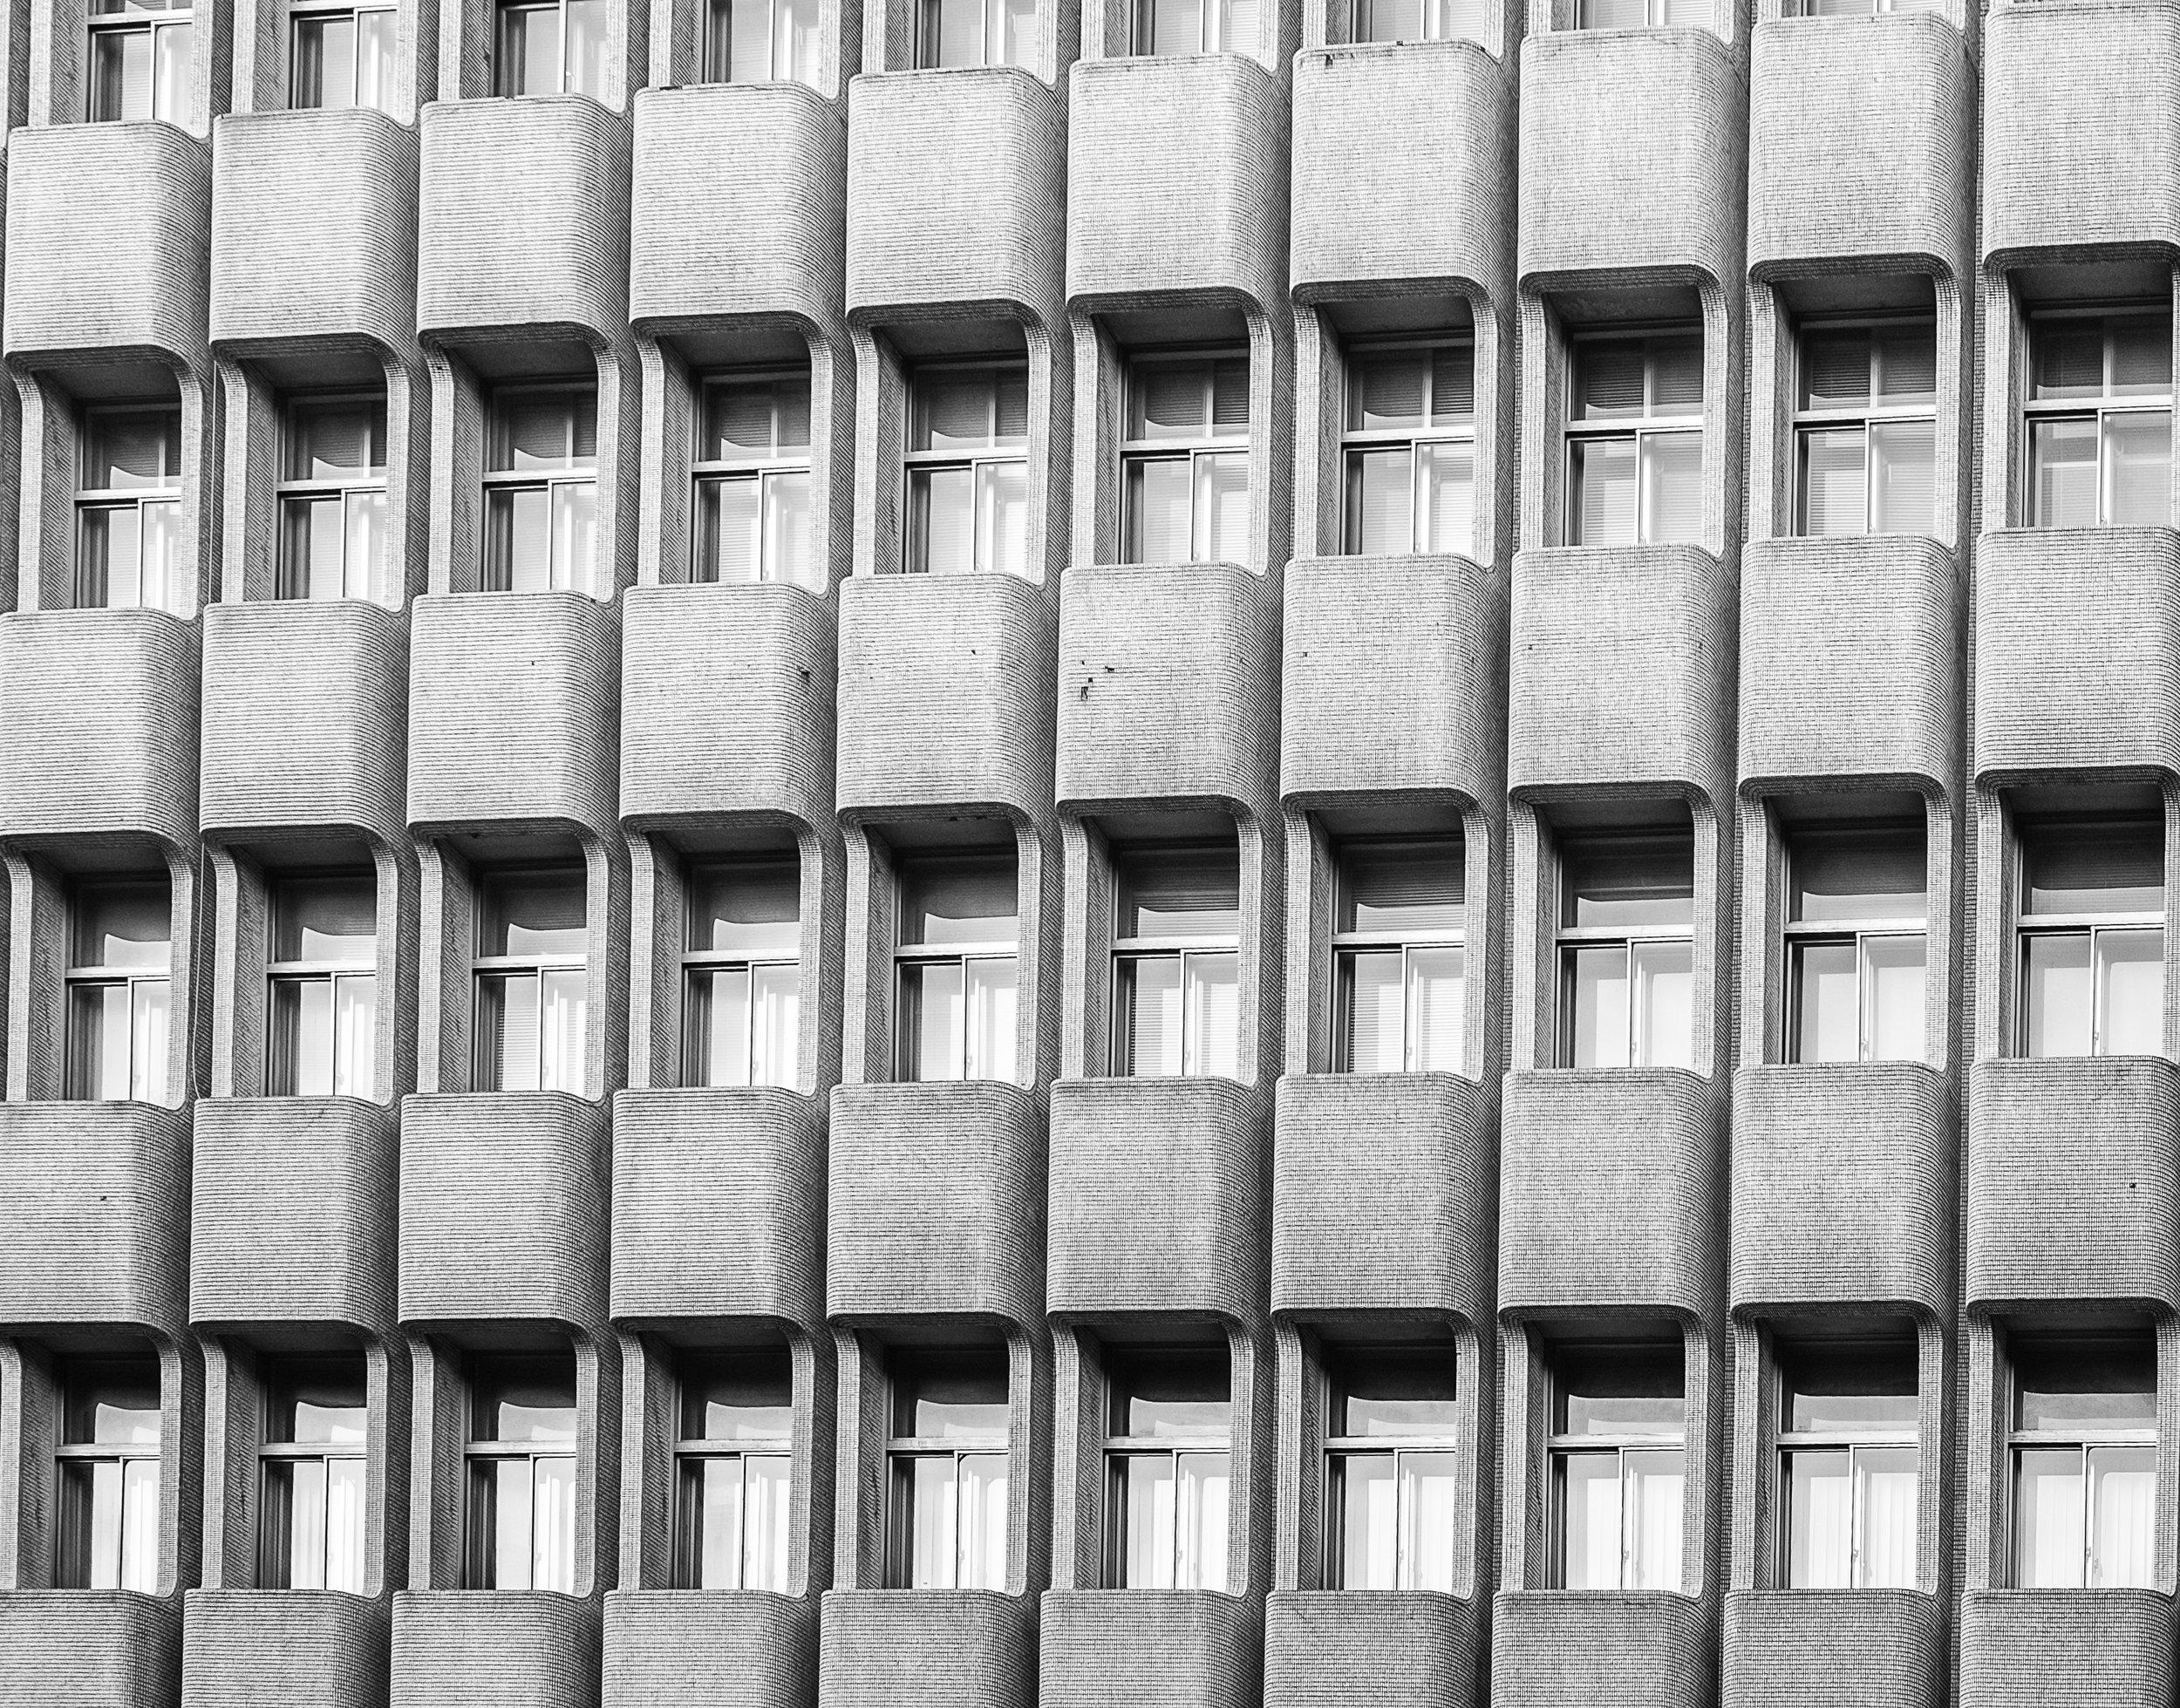 repetitive balconies